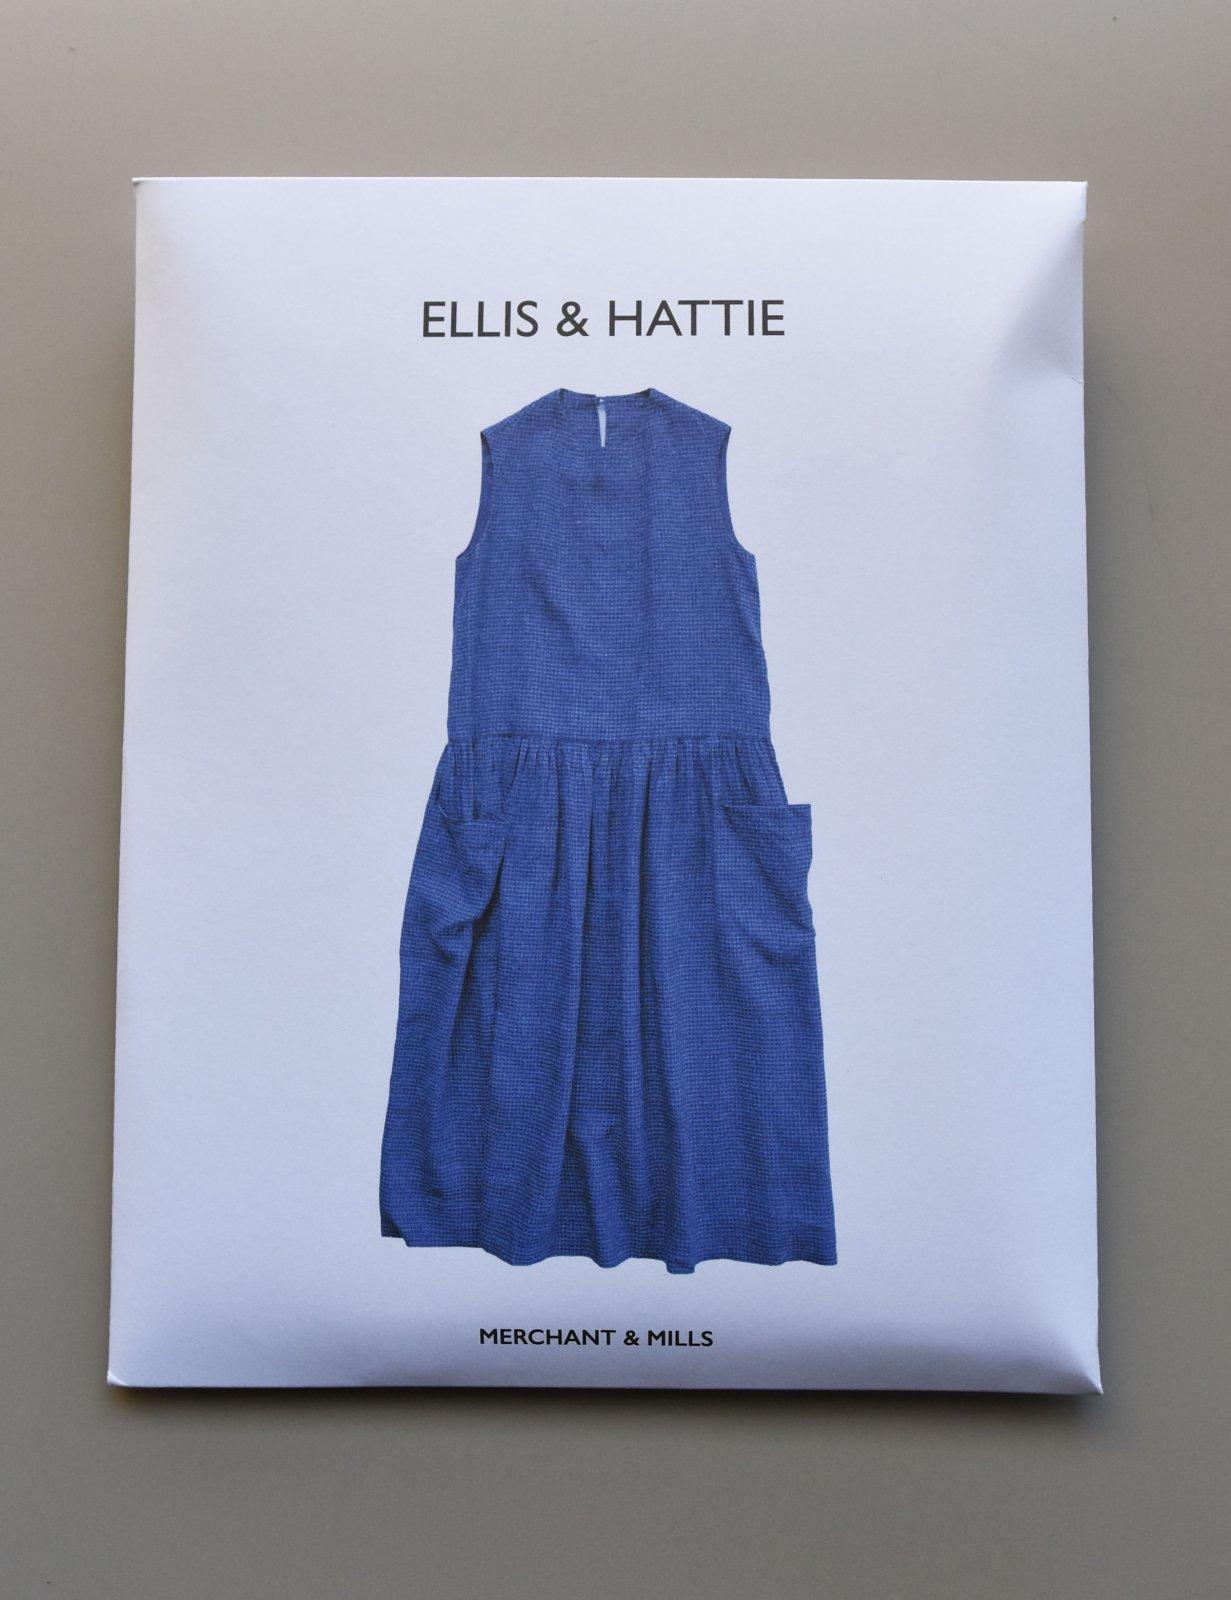 Merchant & Mills - The Ellis & Hattie Pattern